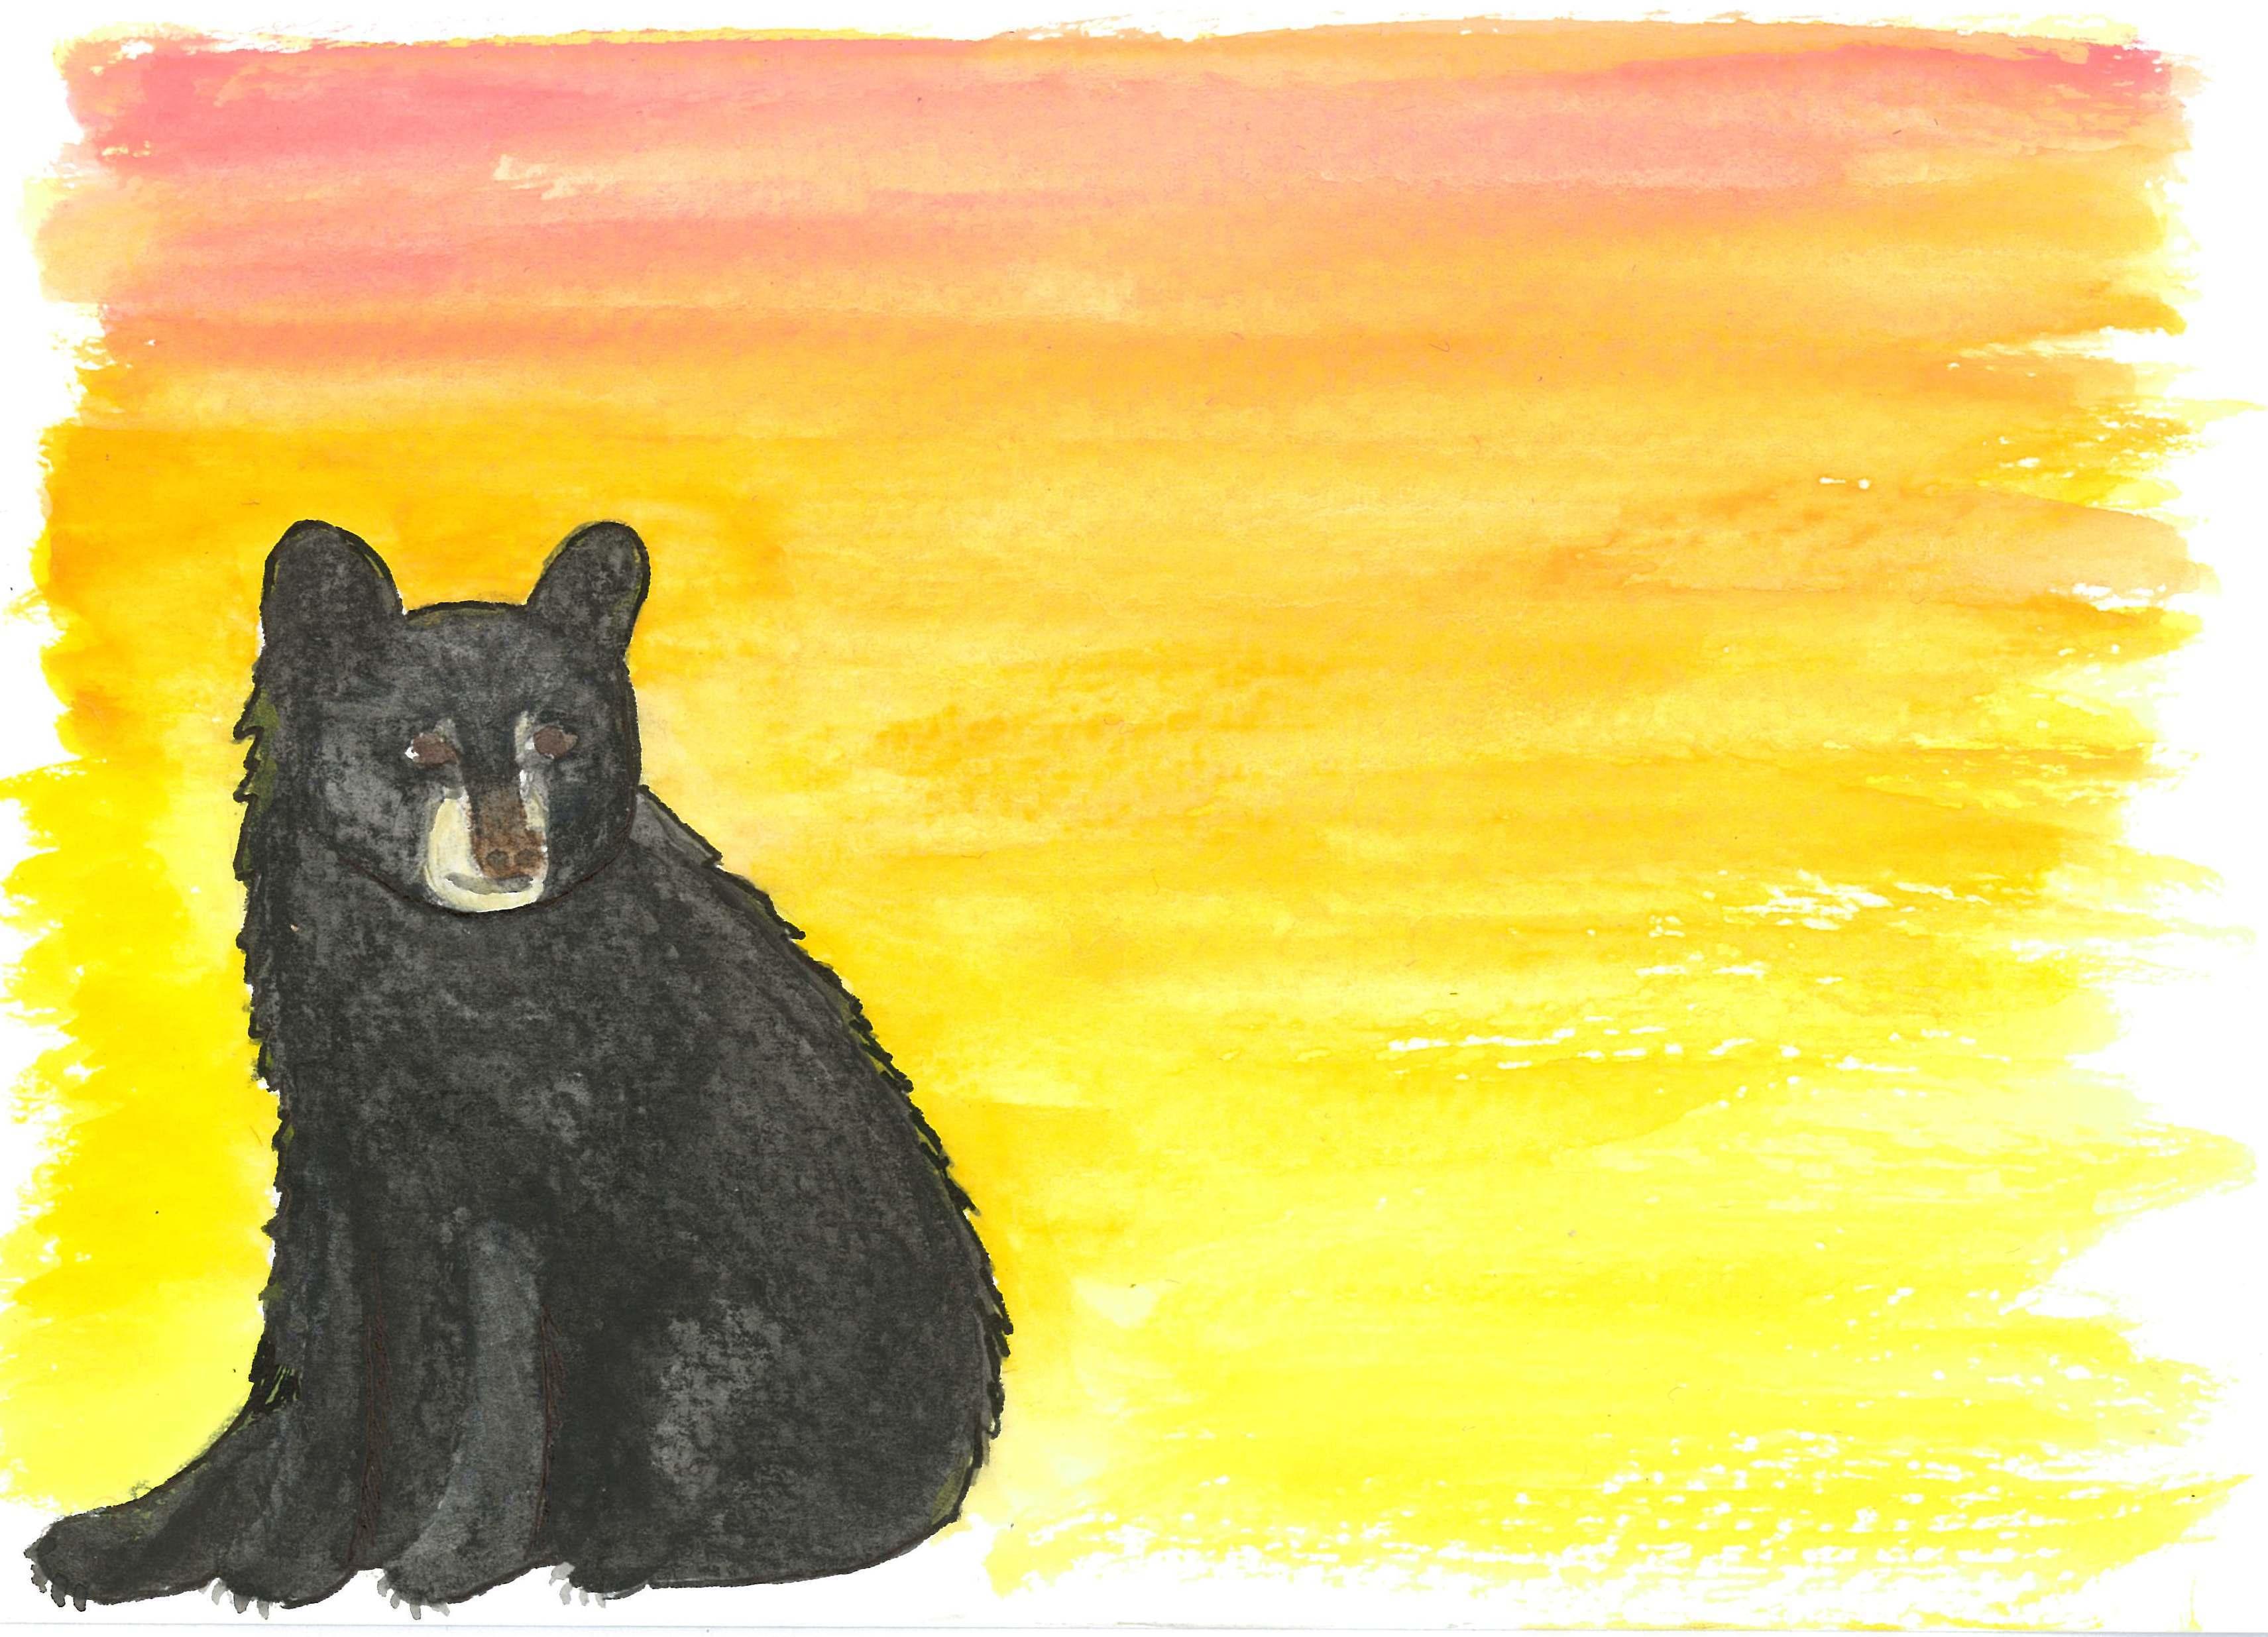 American Black Bear © KIT West Designs